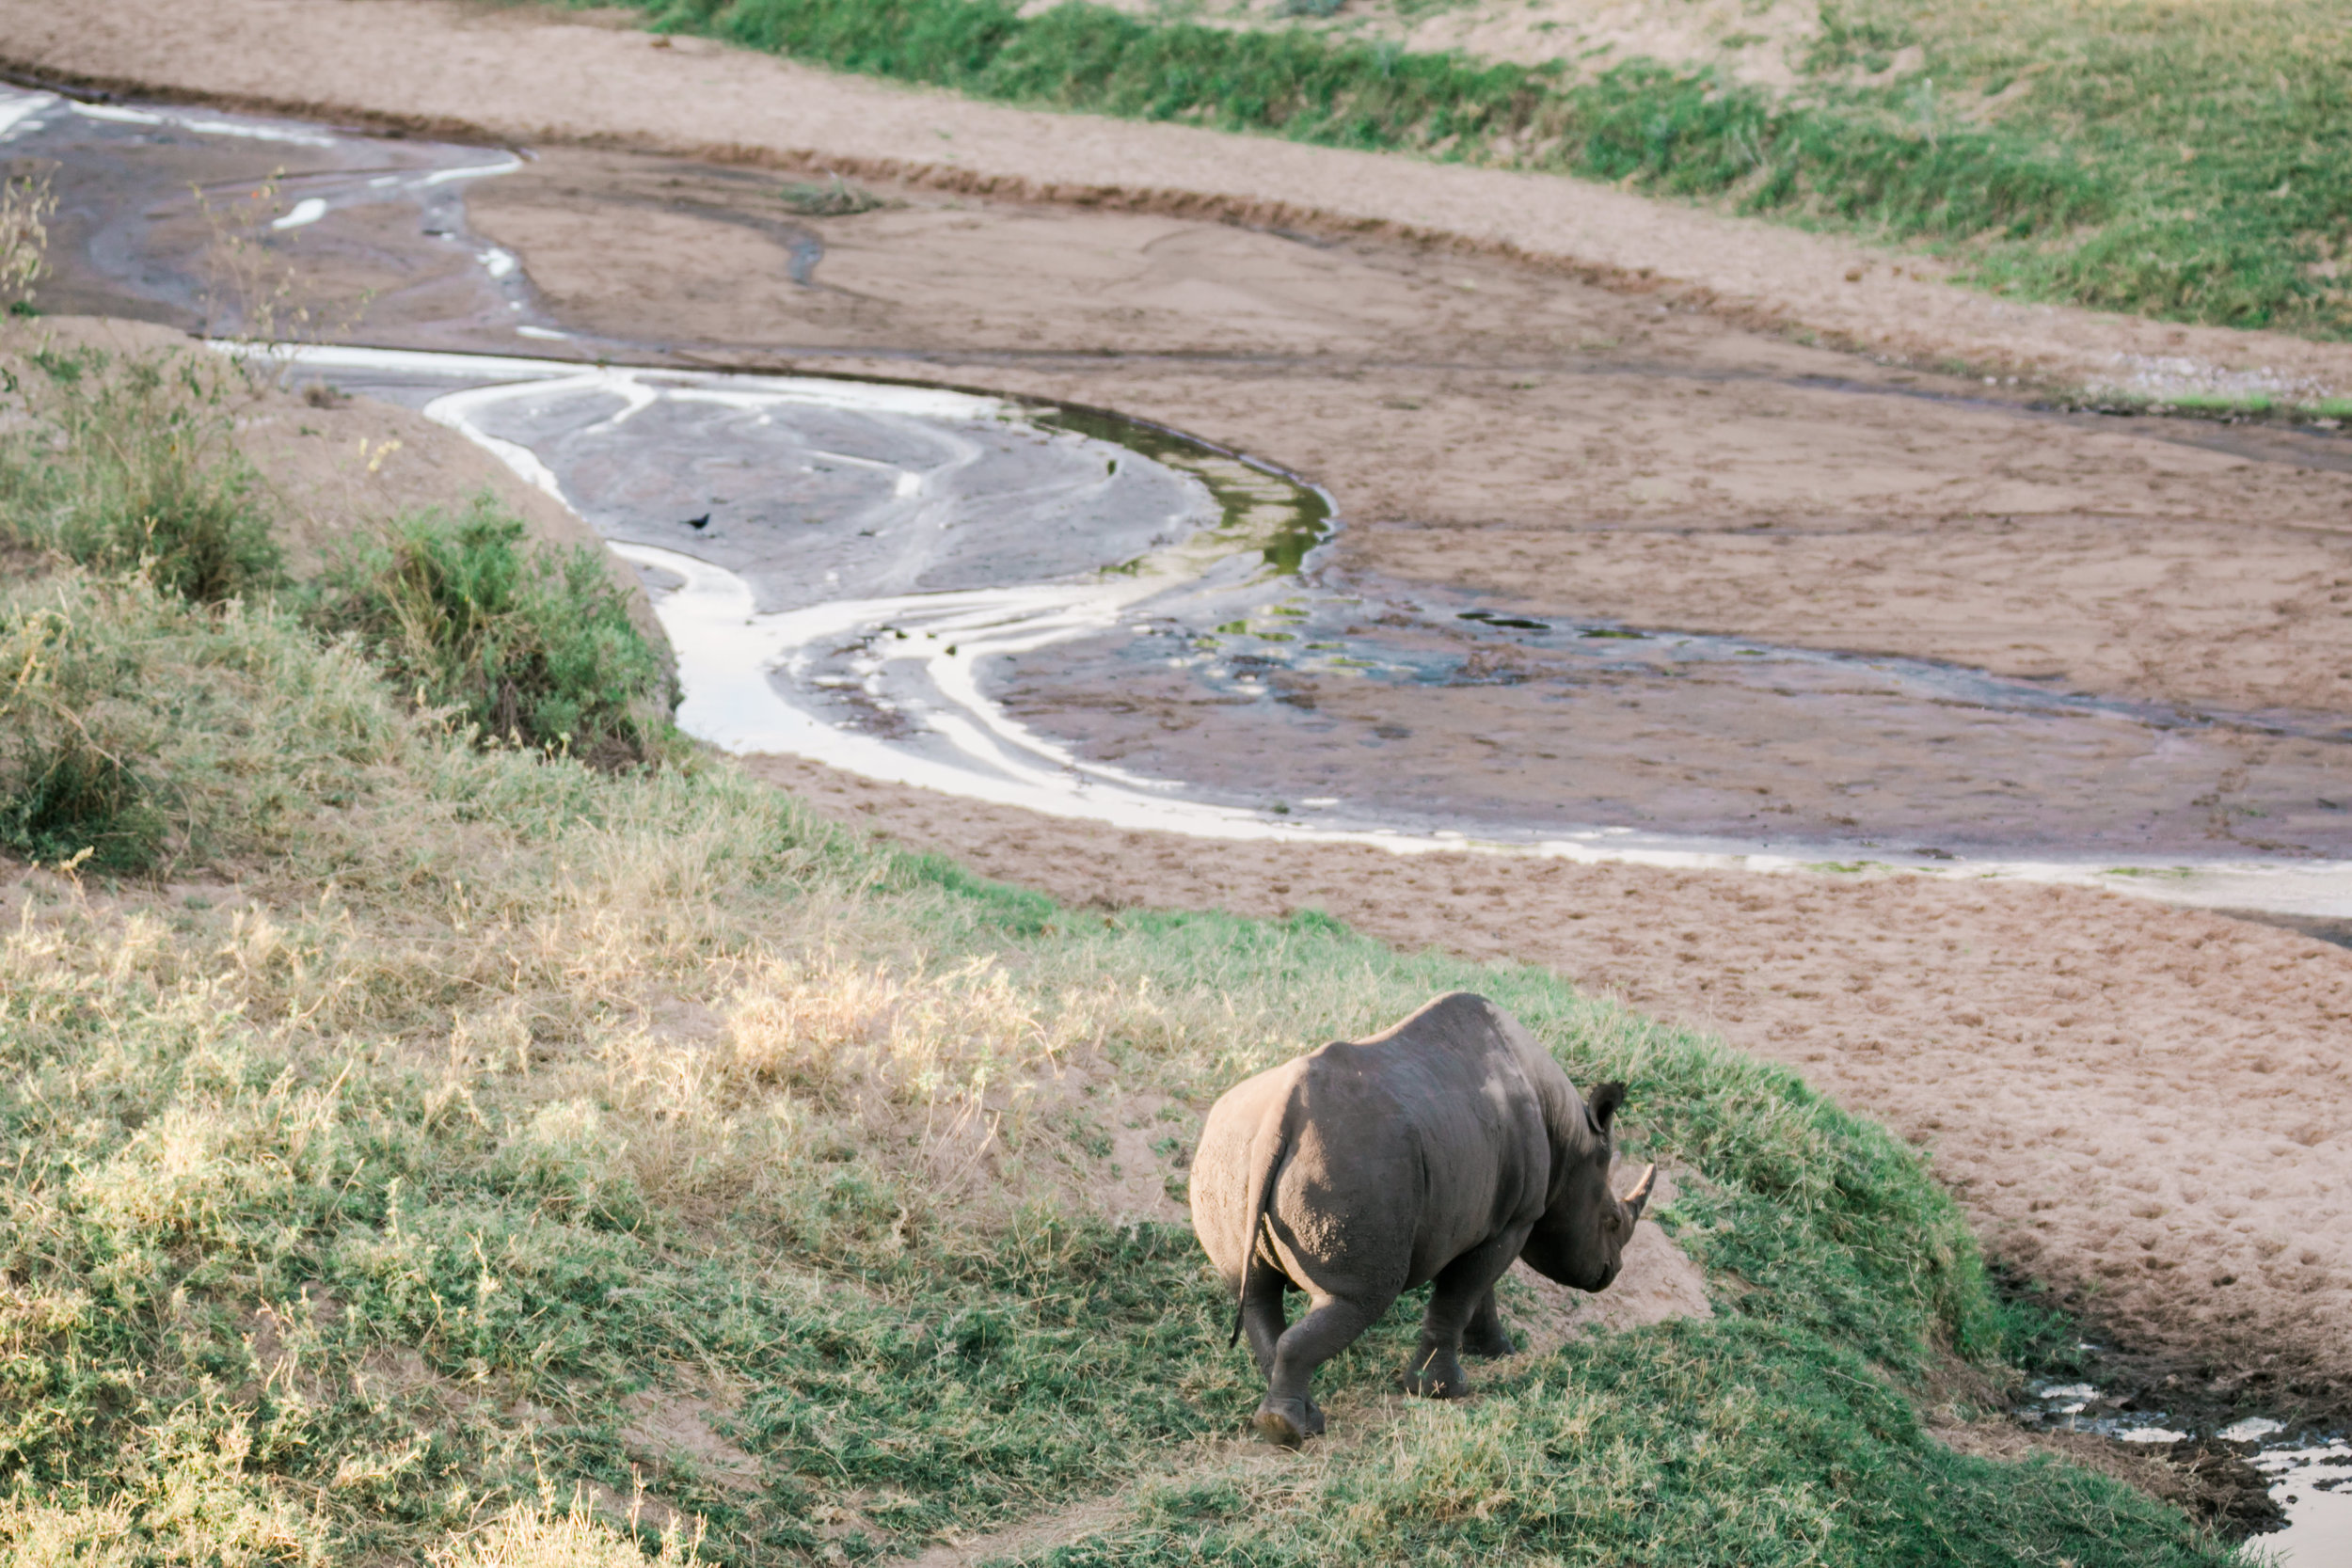 Rhino in the Maasai Mara, Kenya Ph. Valorie Darling